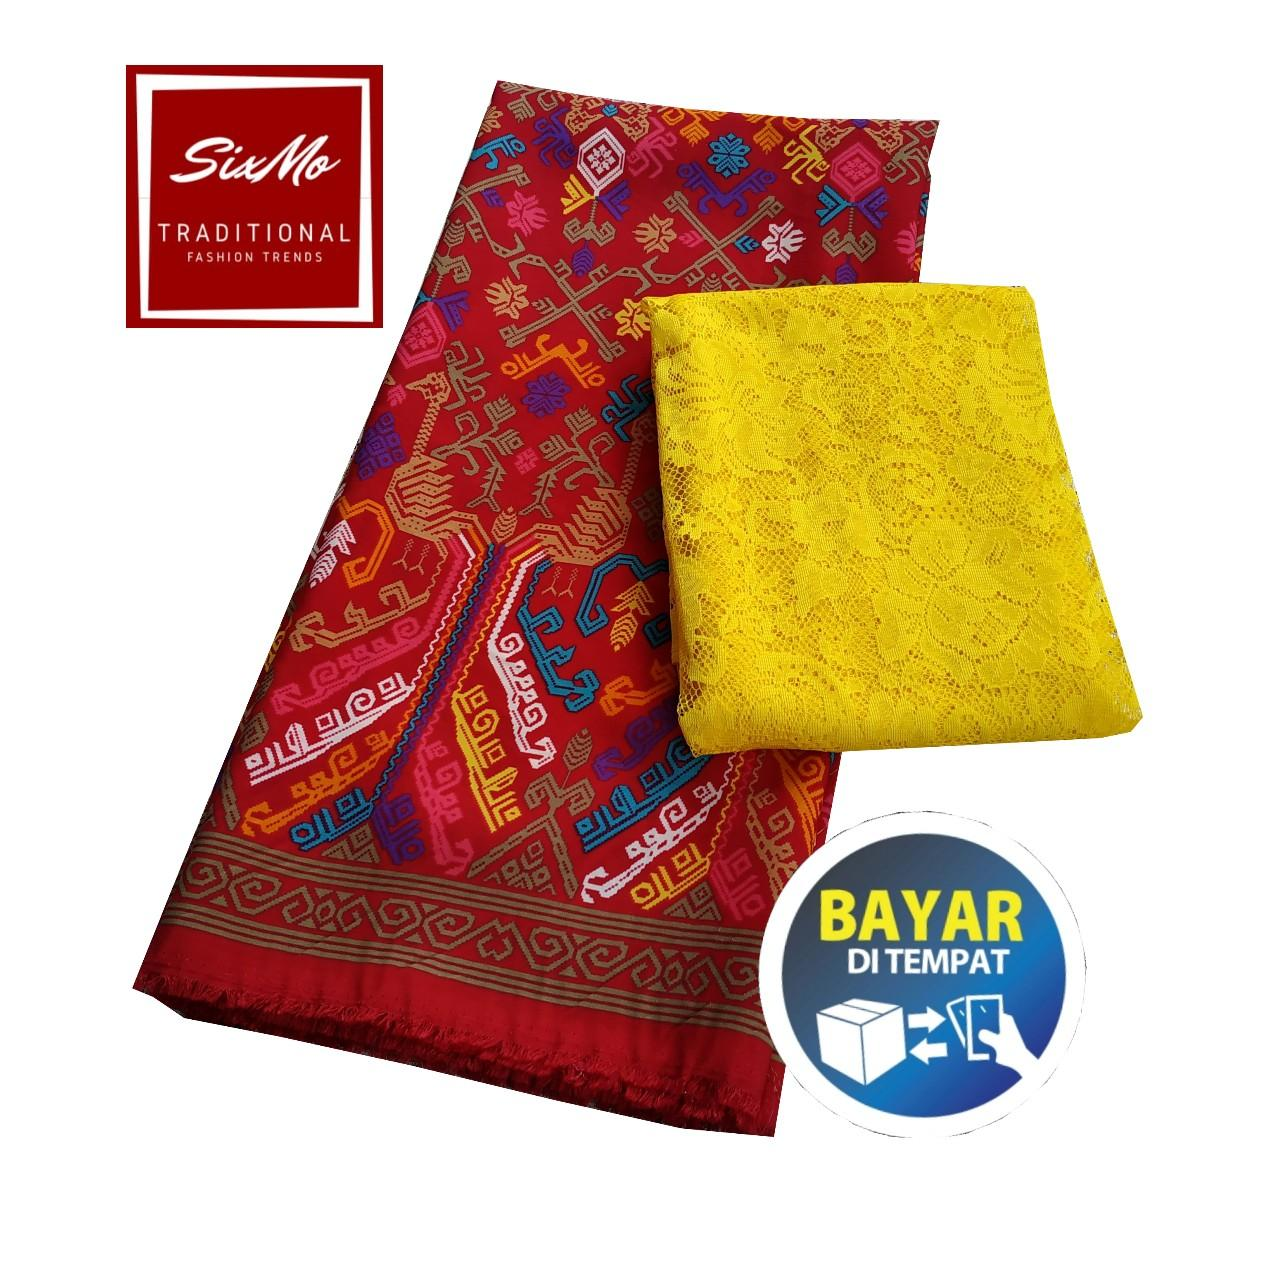 sixmo - setelan kain satin batik merak bali kain atasan dan bawahan